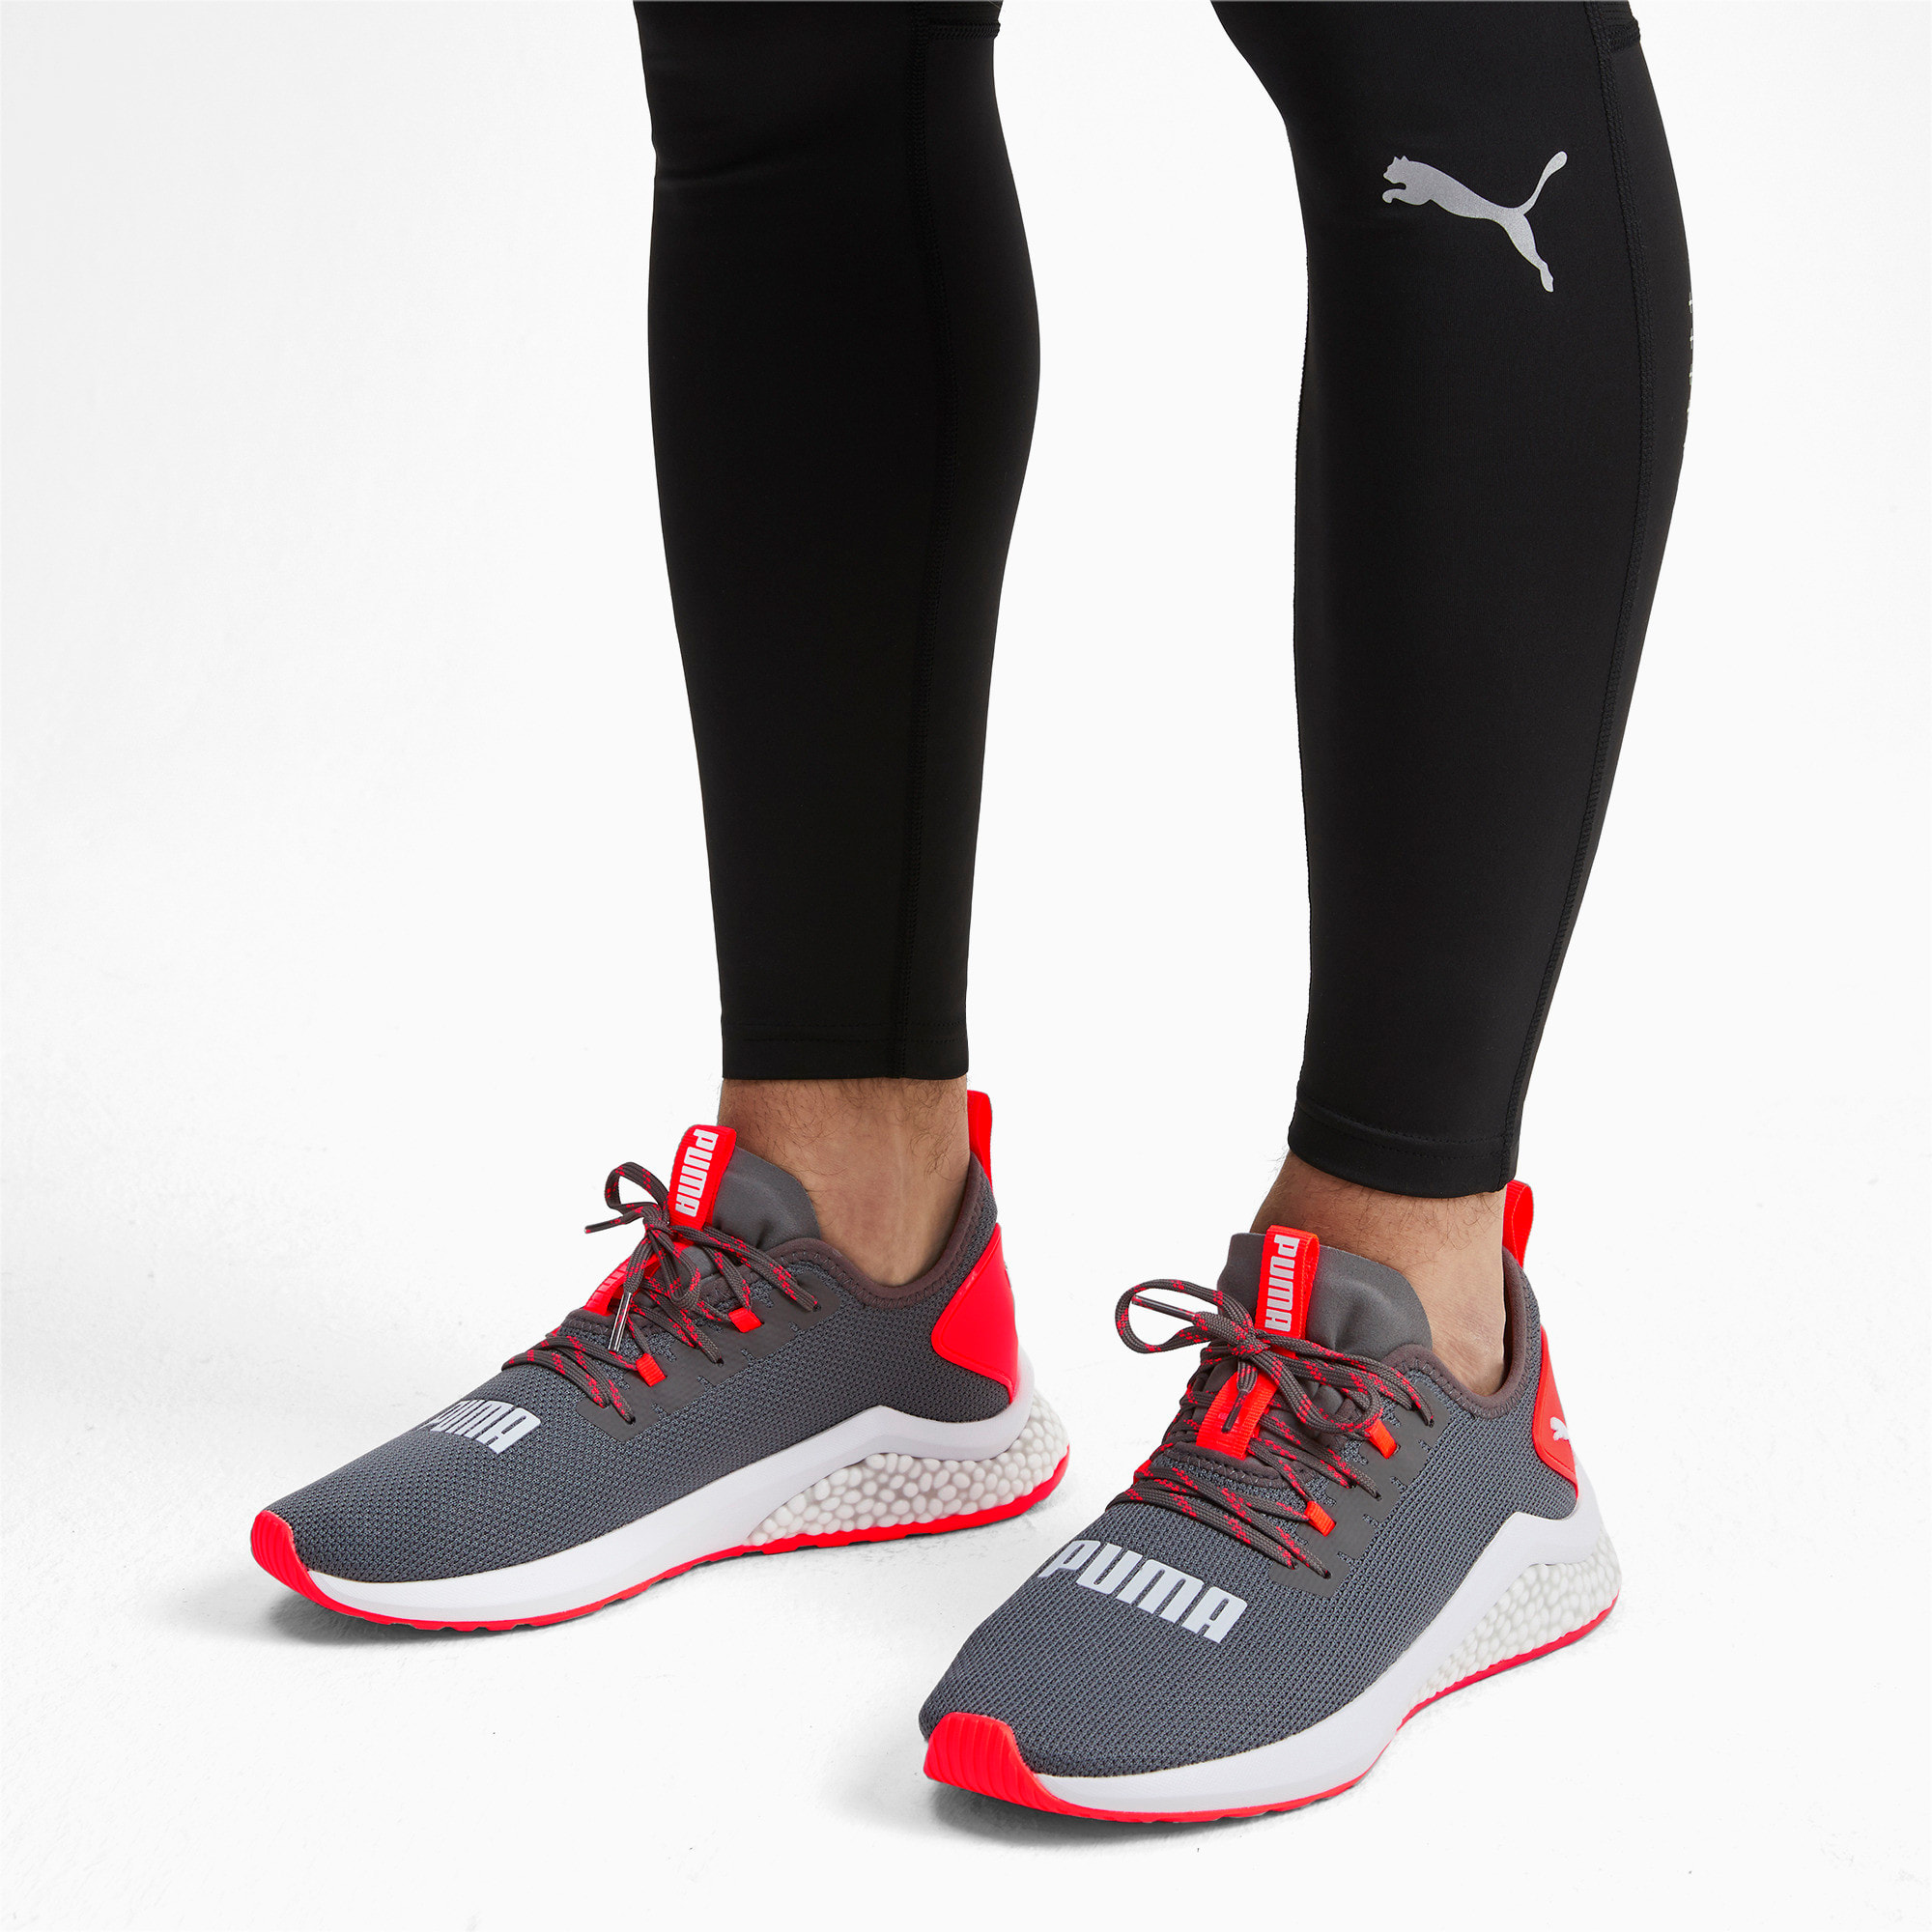 Thumbnail 2 of HYBRID NX Men's Running Shoes, CASTLEROCK-Nrgy Red, medium